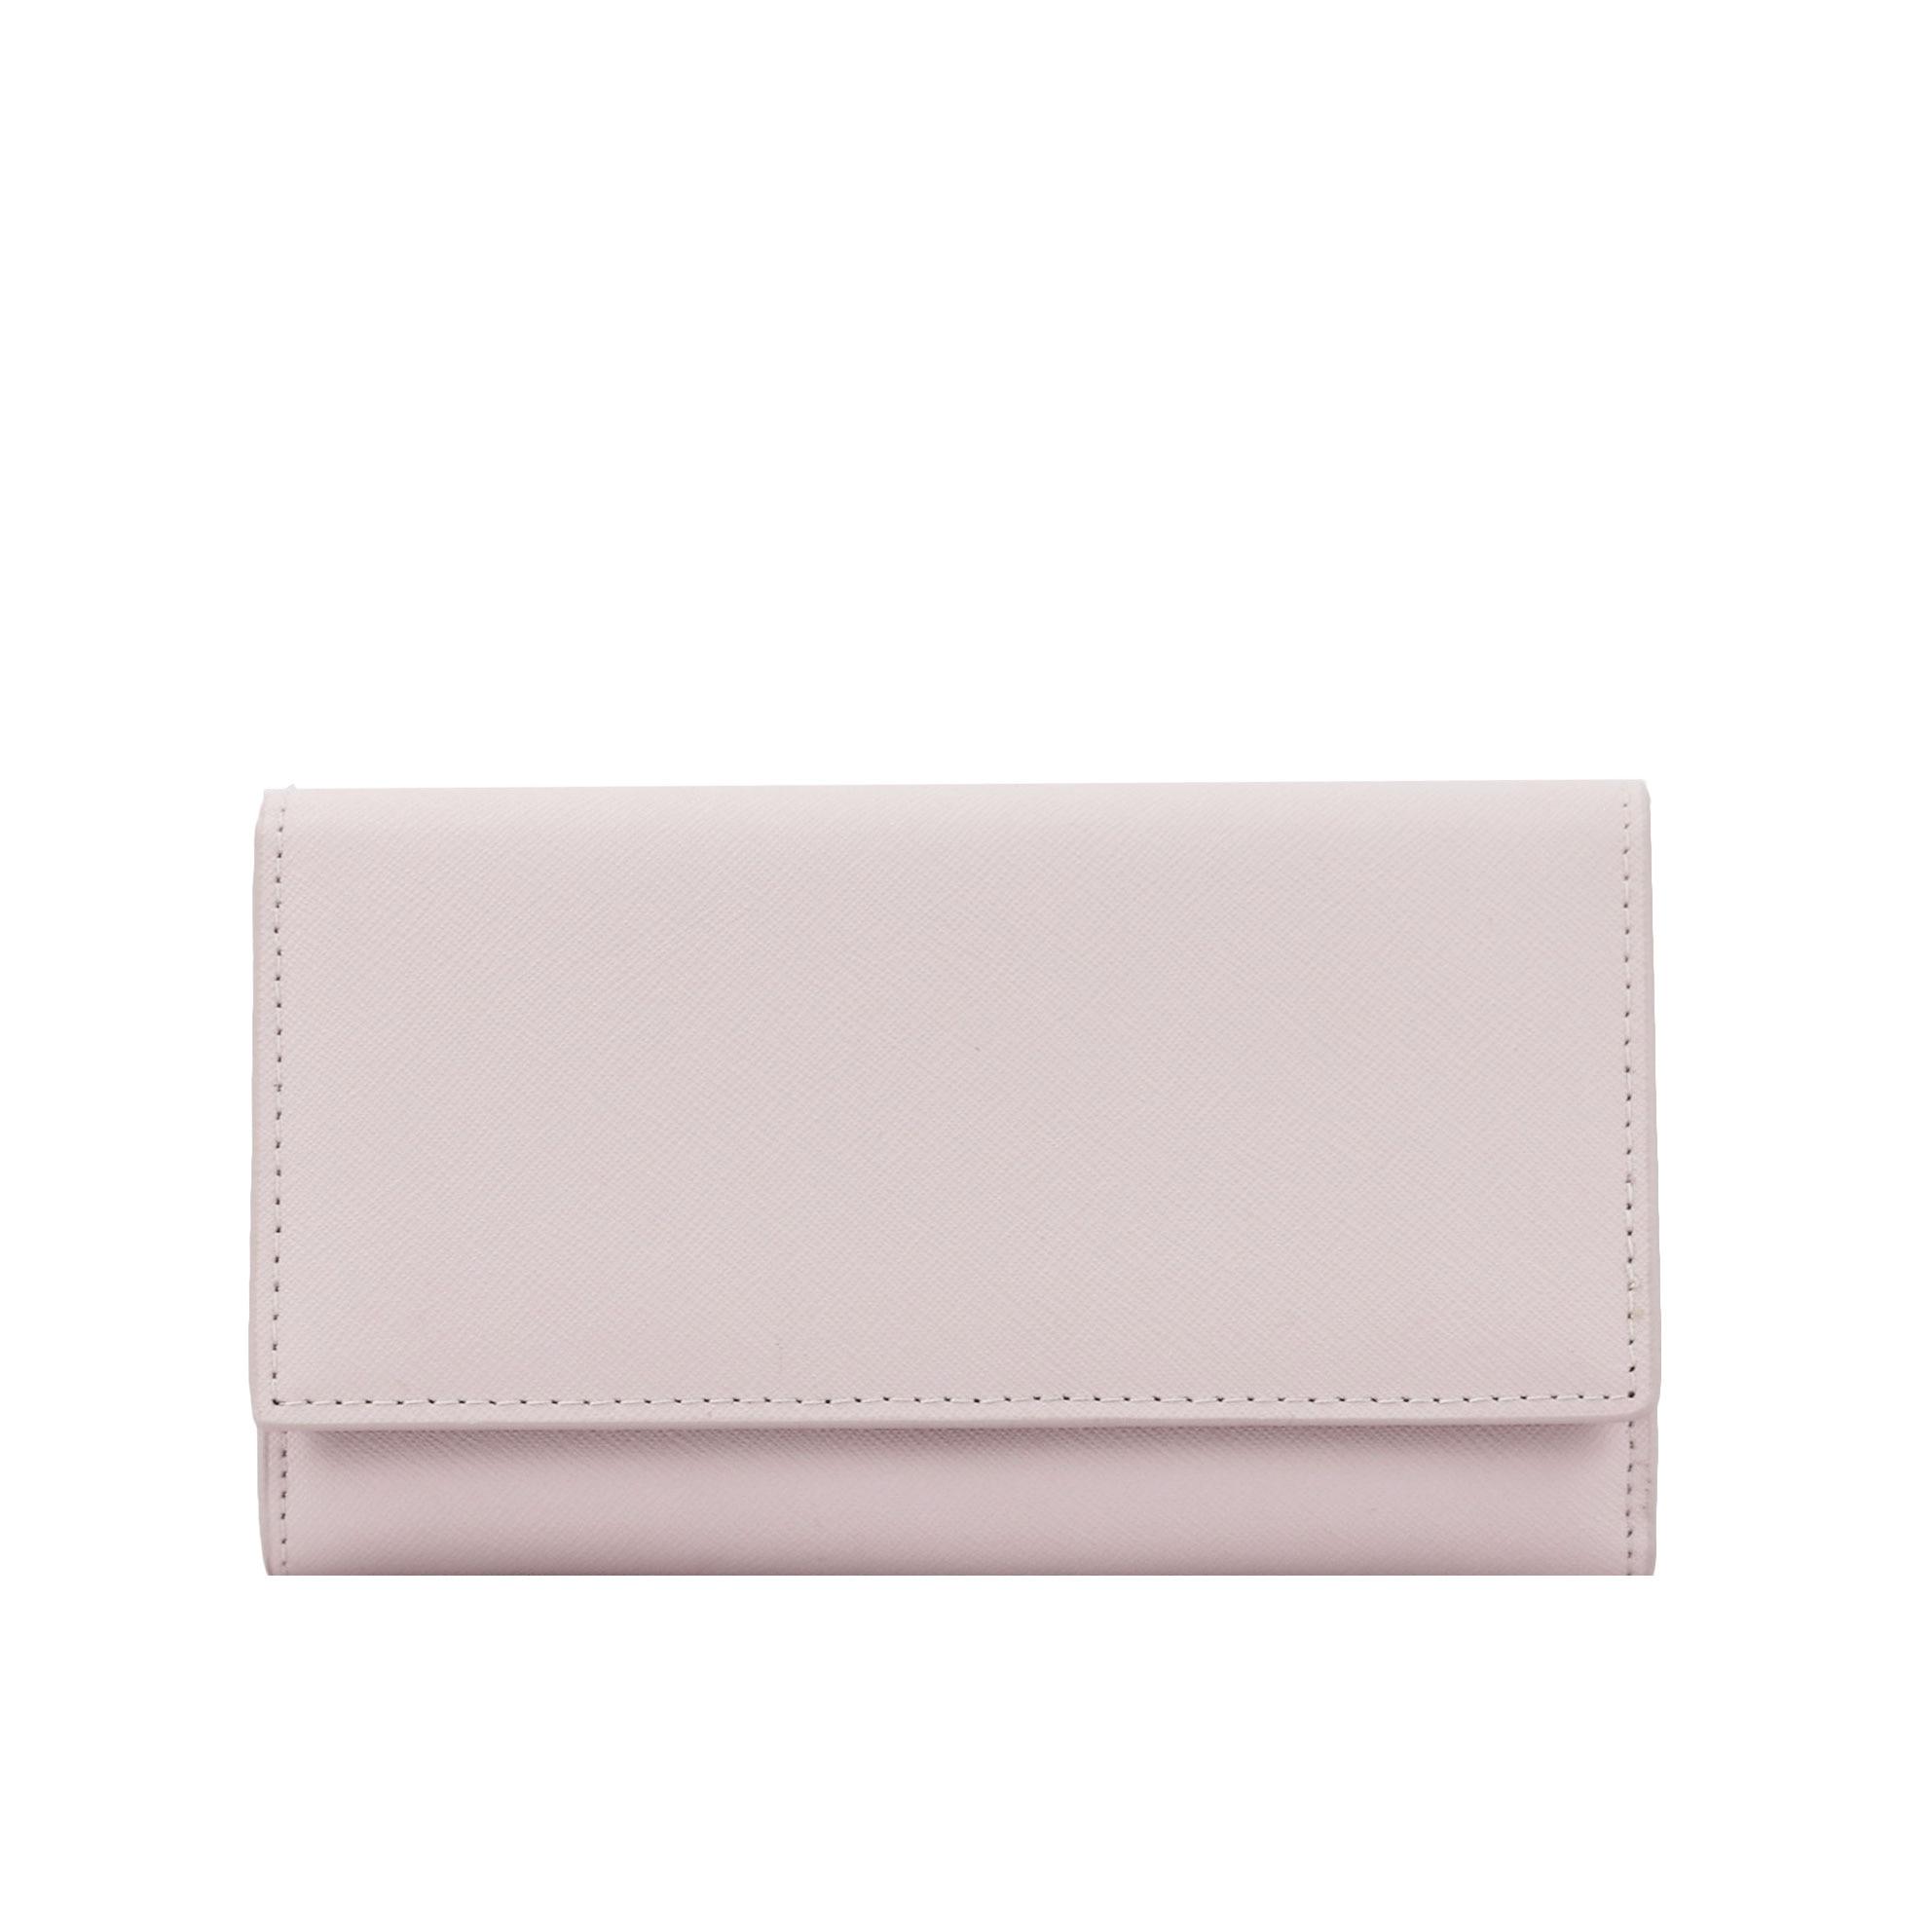 New Genuine Saffiano Leather Wallet Femal 2020 Fashion Women Clutch Purse Clip Wallet Designer Ladies Purse Card Holder Coin Bag